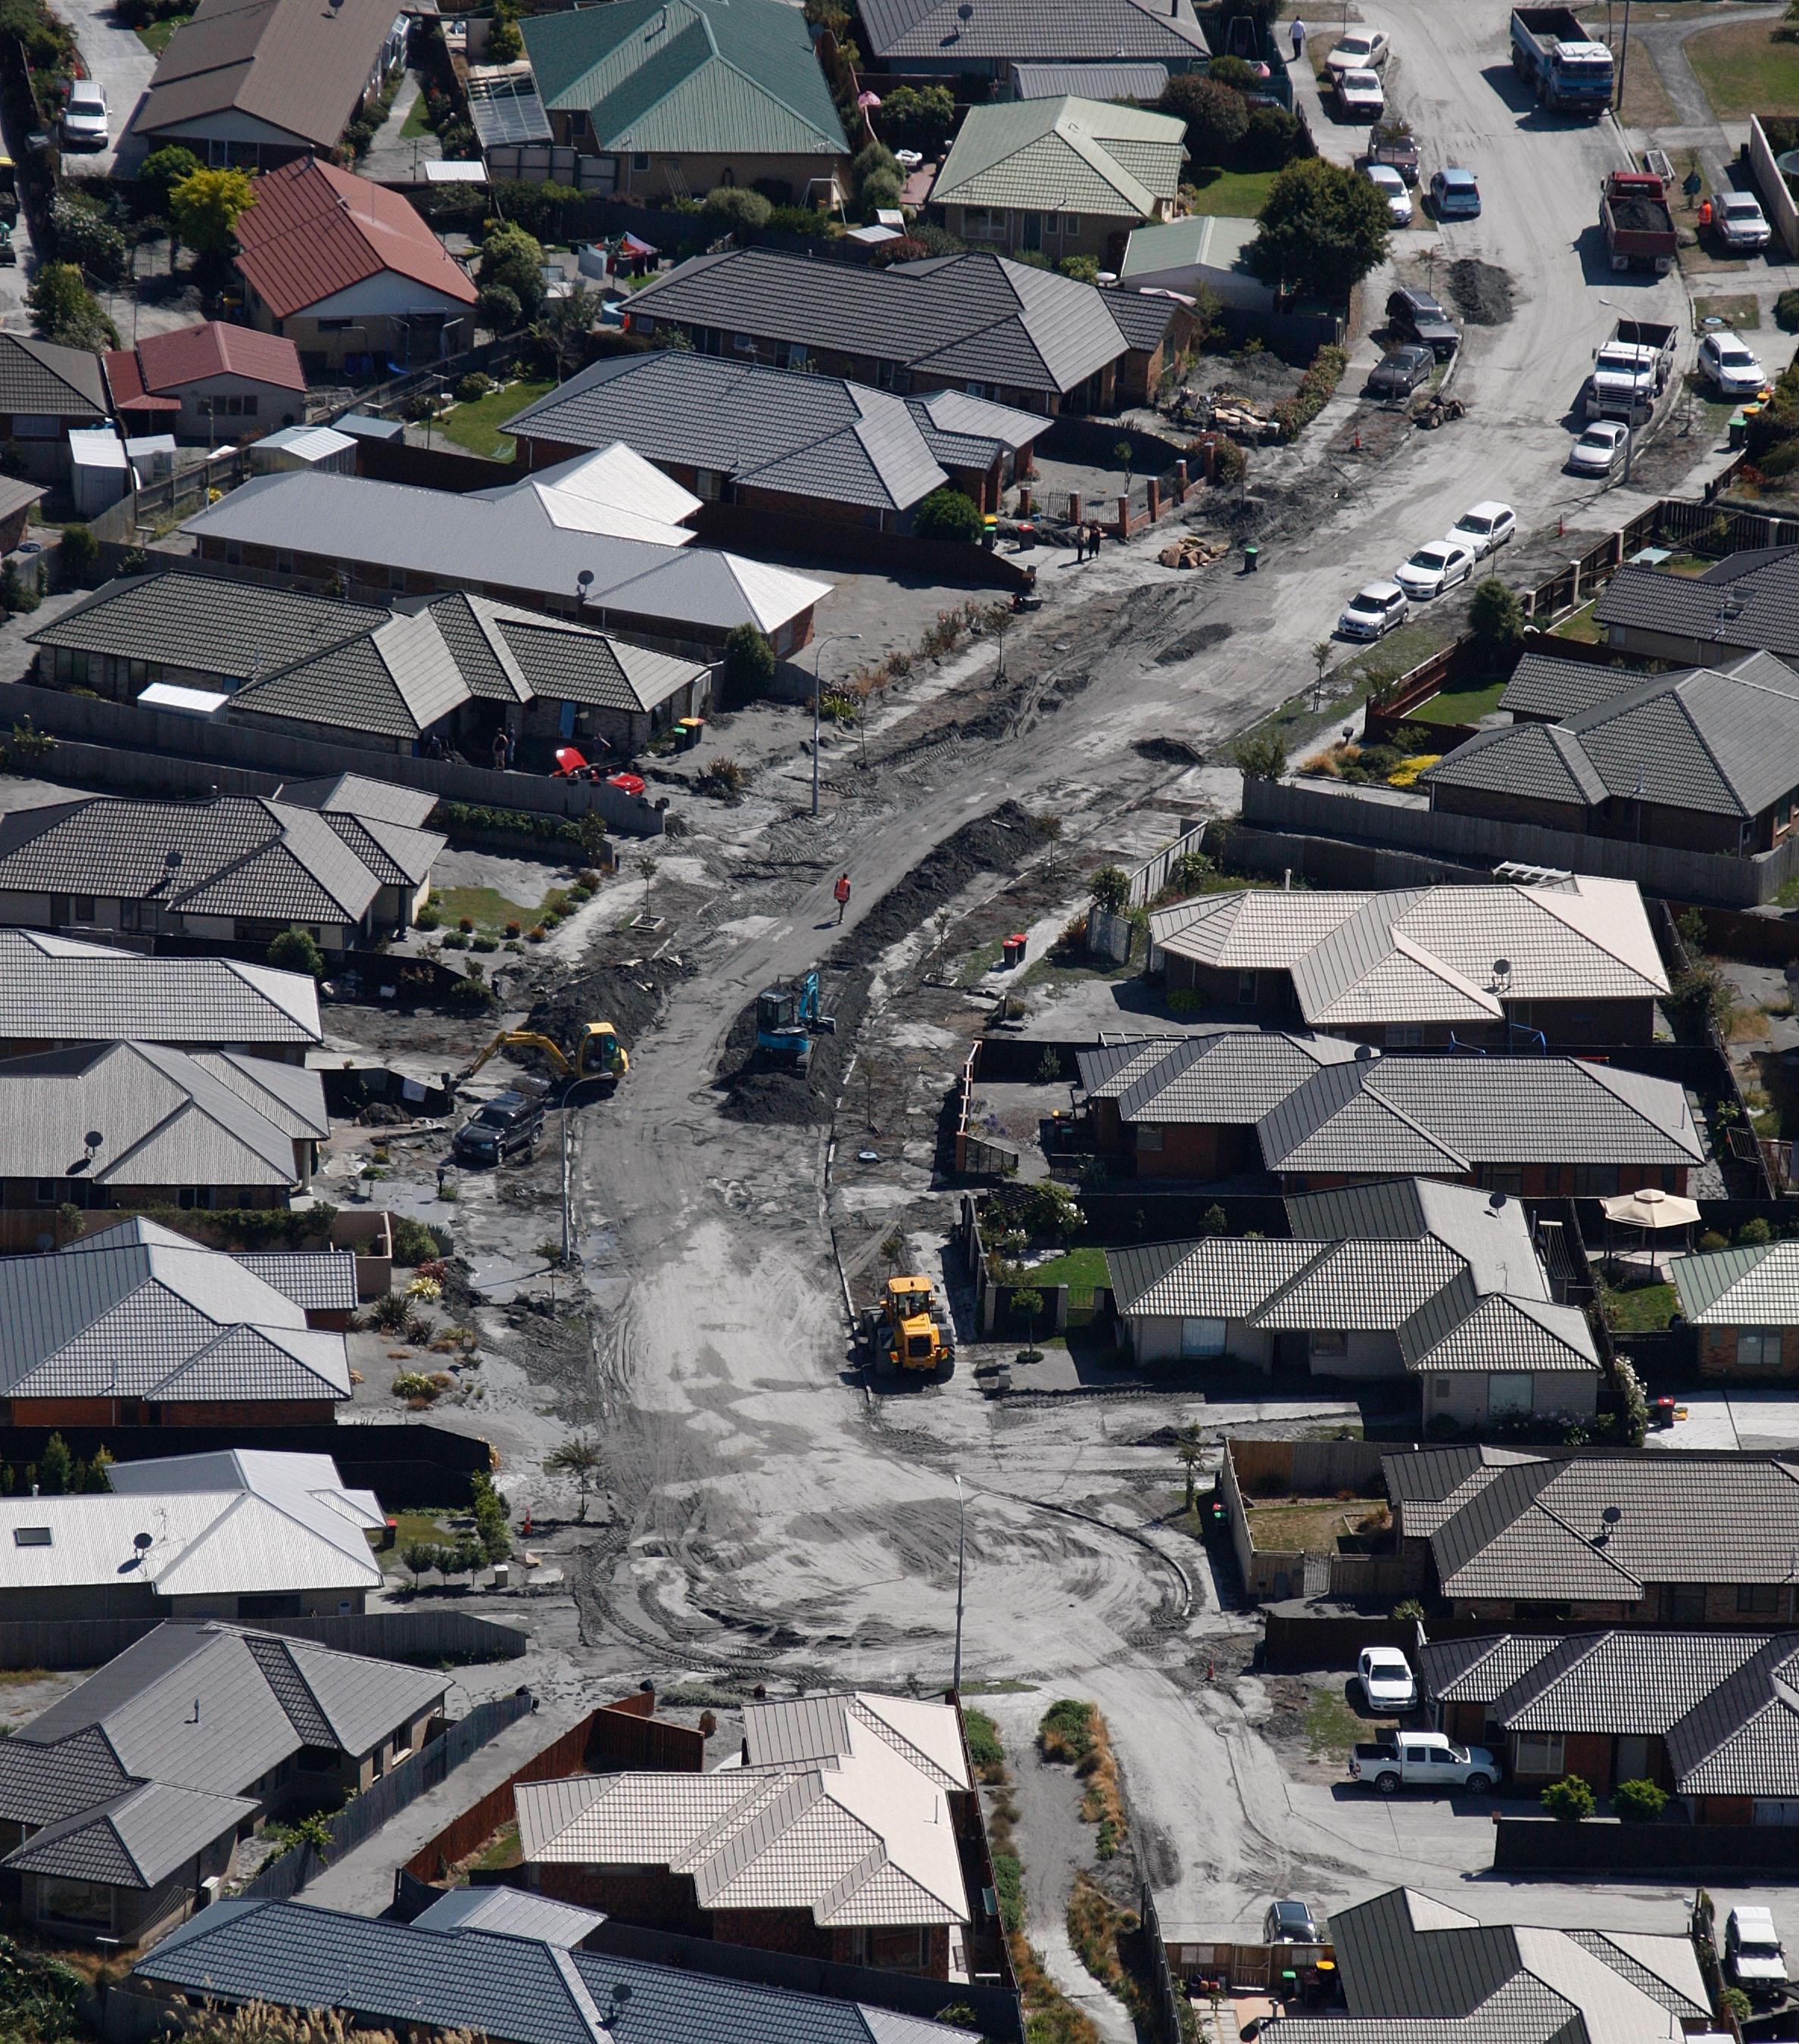 Aftershock: The debacle of shoddy Christchurch earthquake repairs